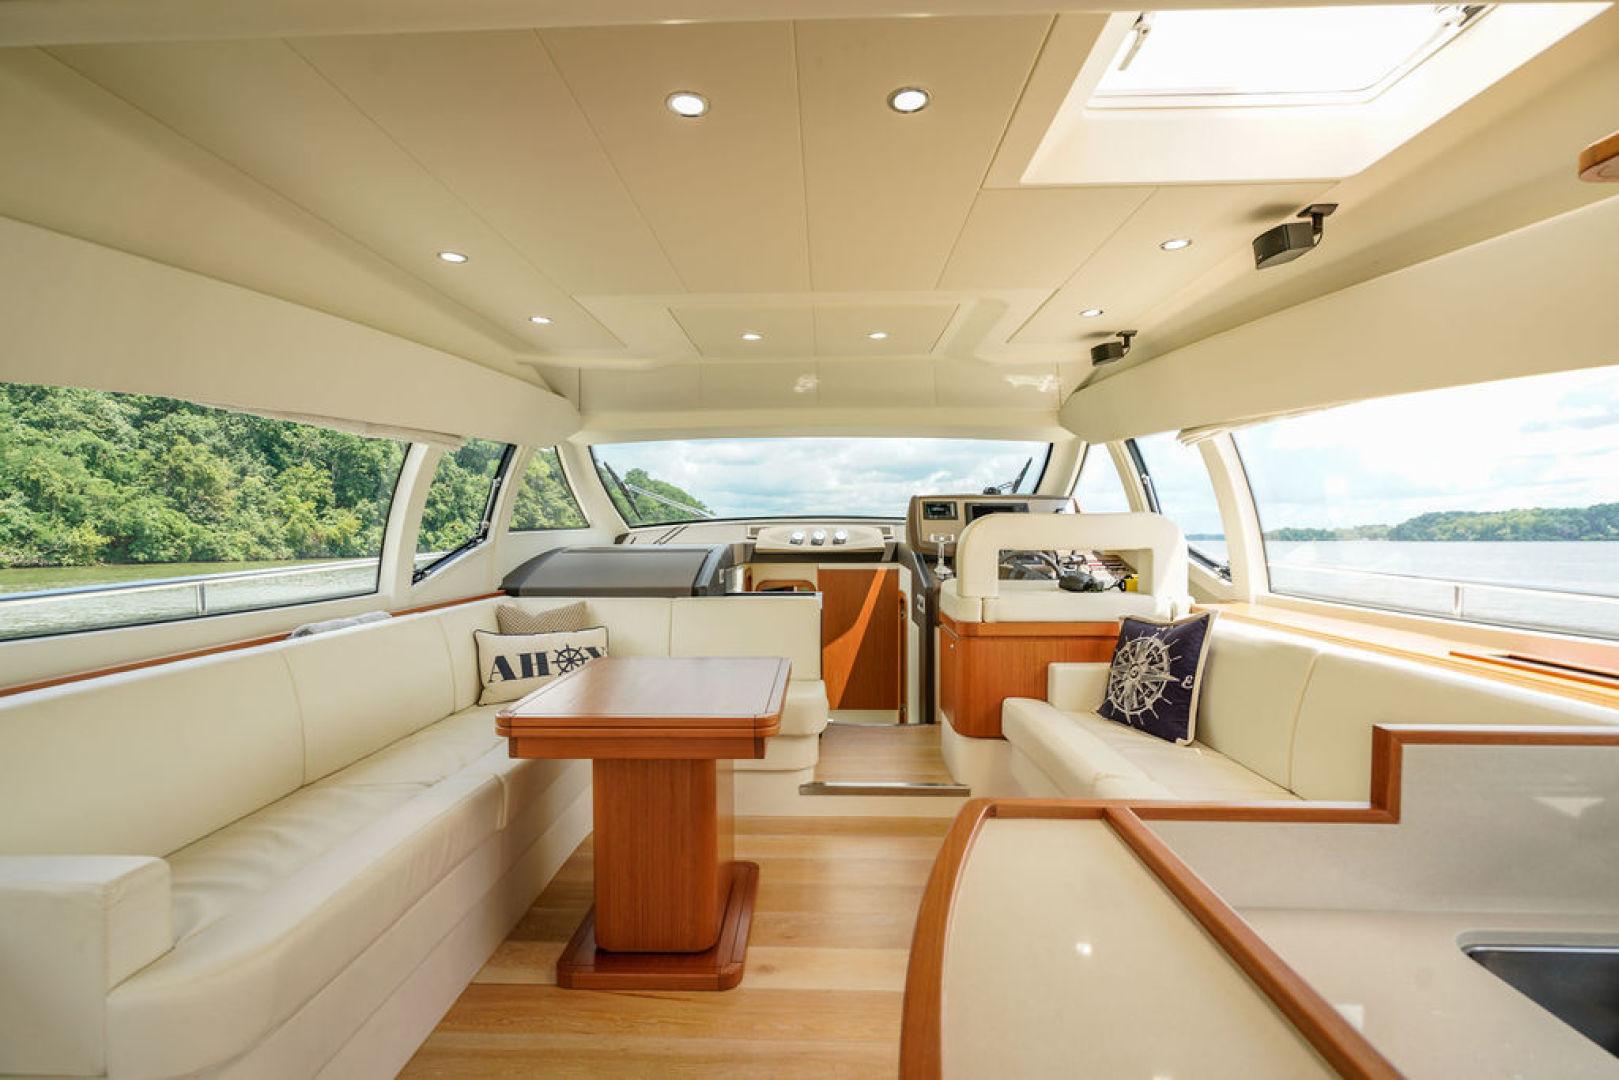 Ferretti Yachts-530 2013-ISLAND GIRL Mount Juliet-Tennessee-United States-1574693   Thumbnail